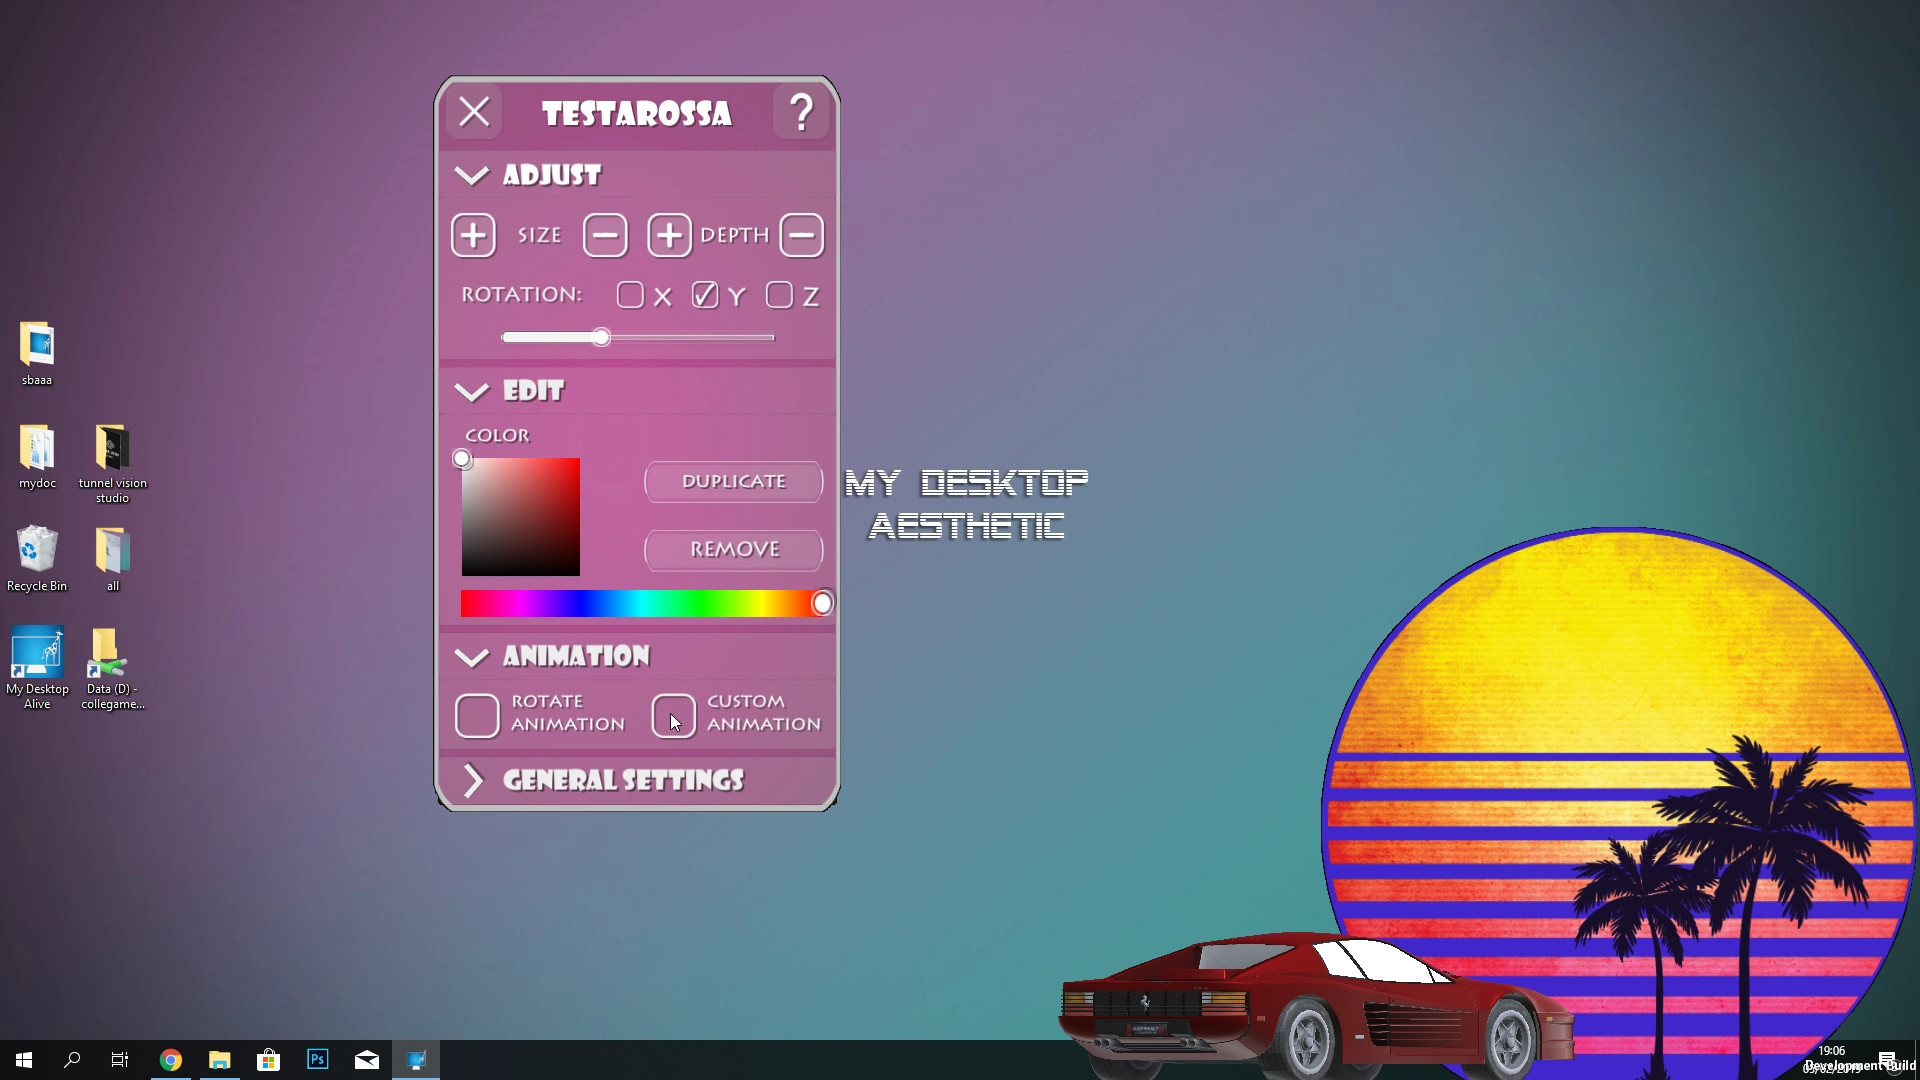 My Desktop Alive - Aesthetic